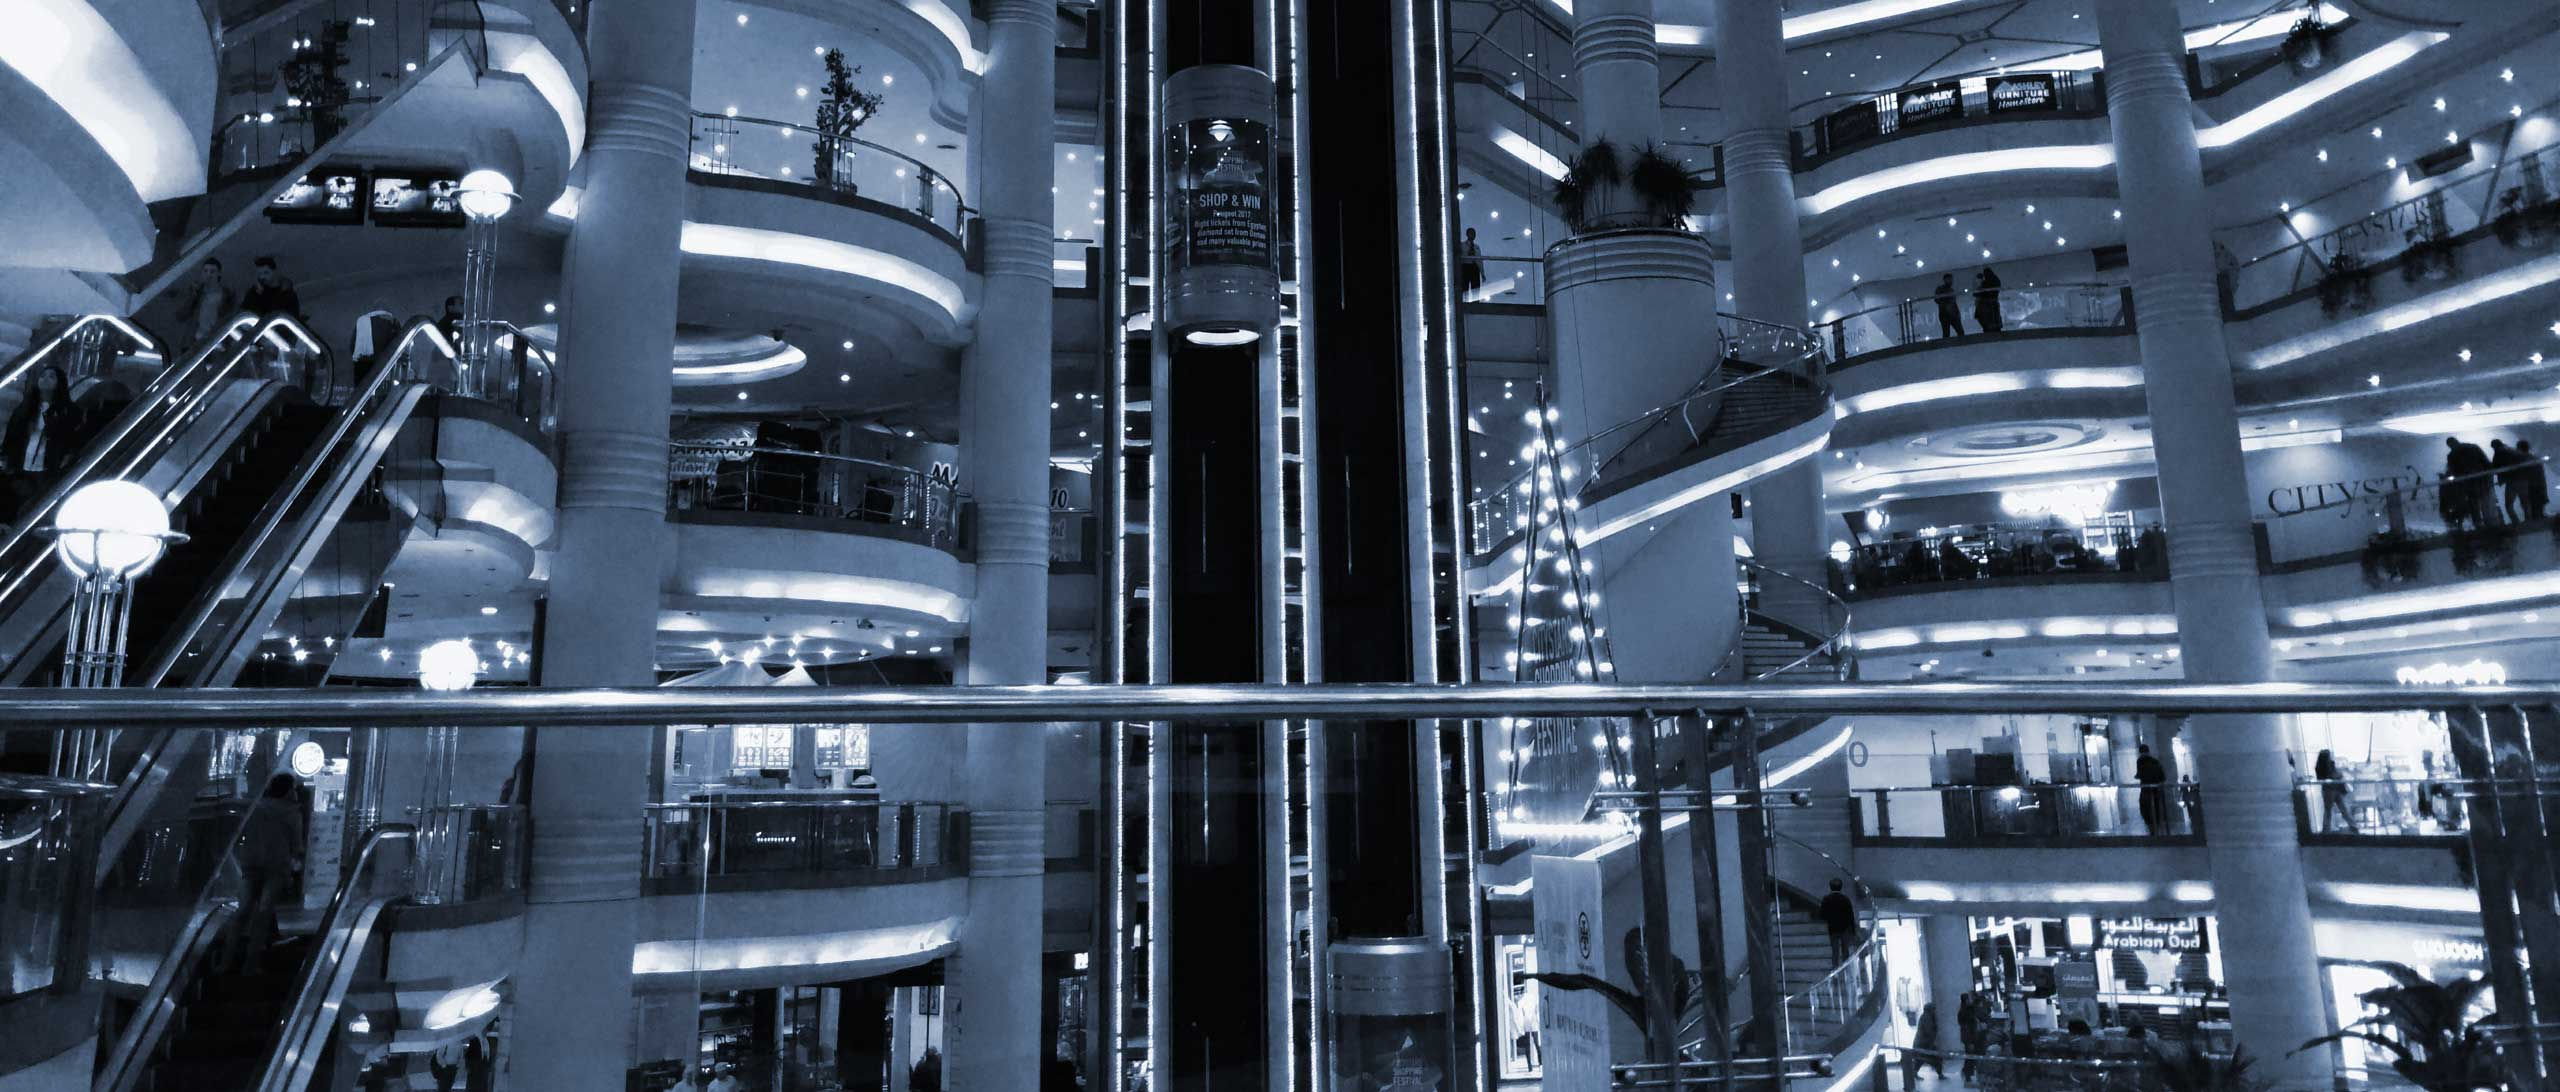 Cadena de centros comerciales plaza refinancia pasivos bancarios en Chile